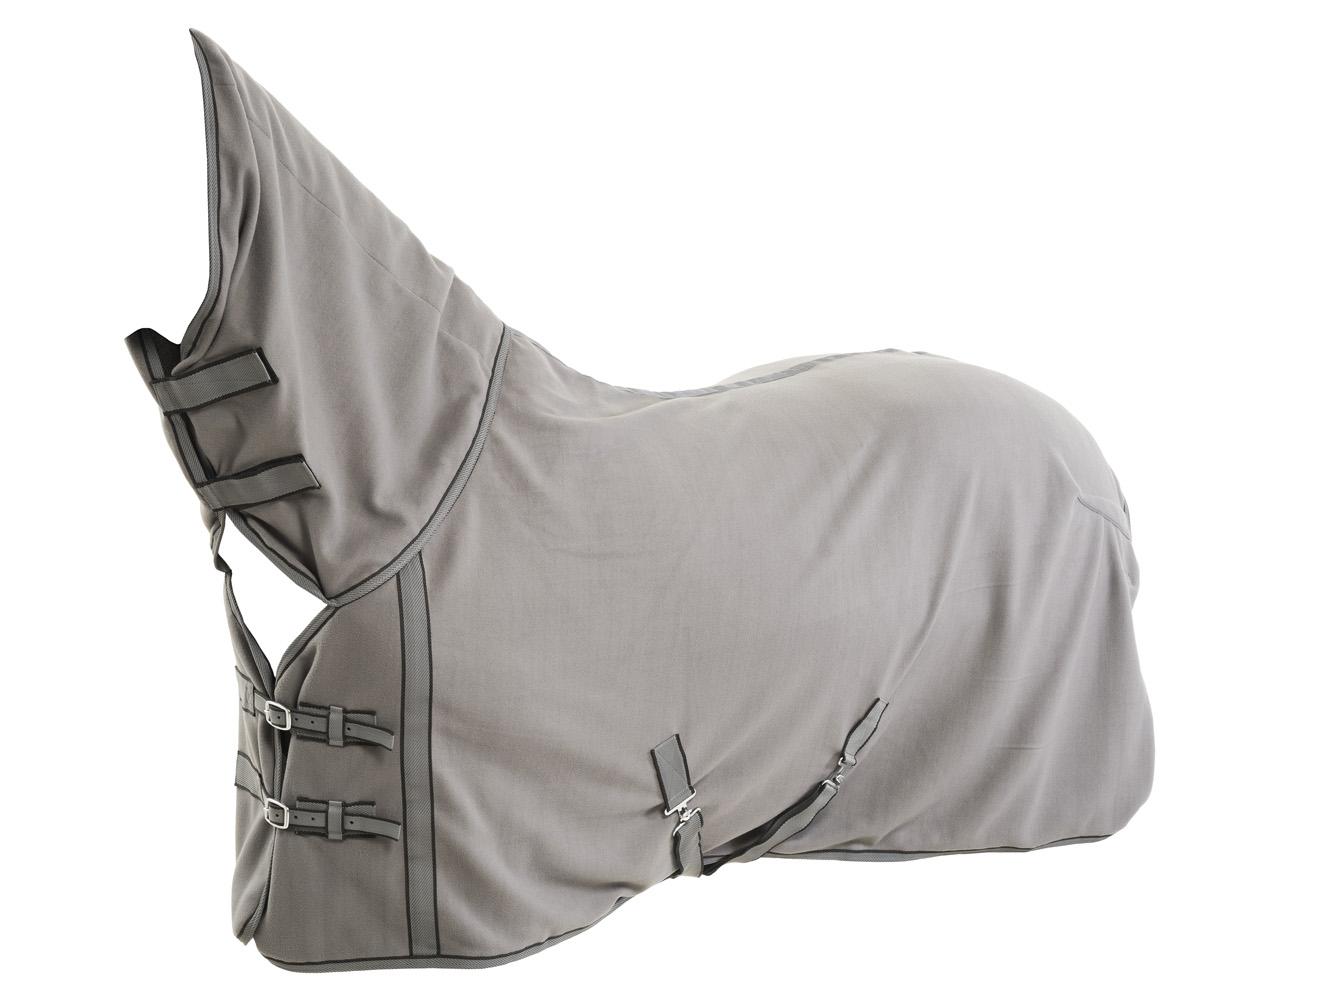 Horse Comfort fullneck fleeceloimi